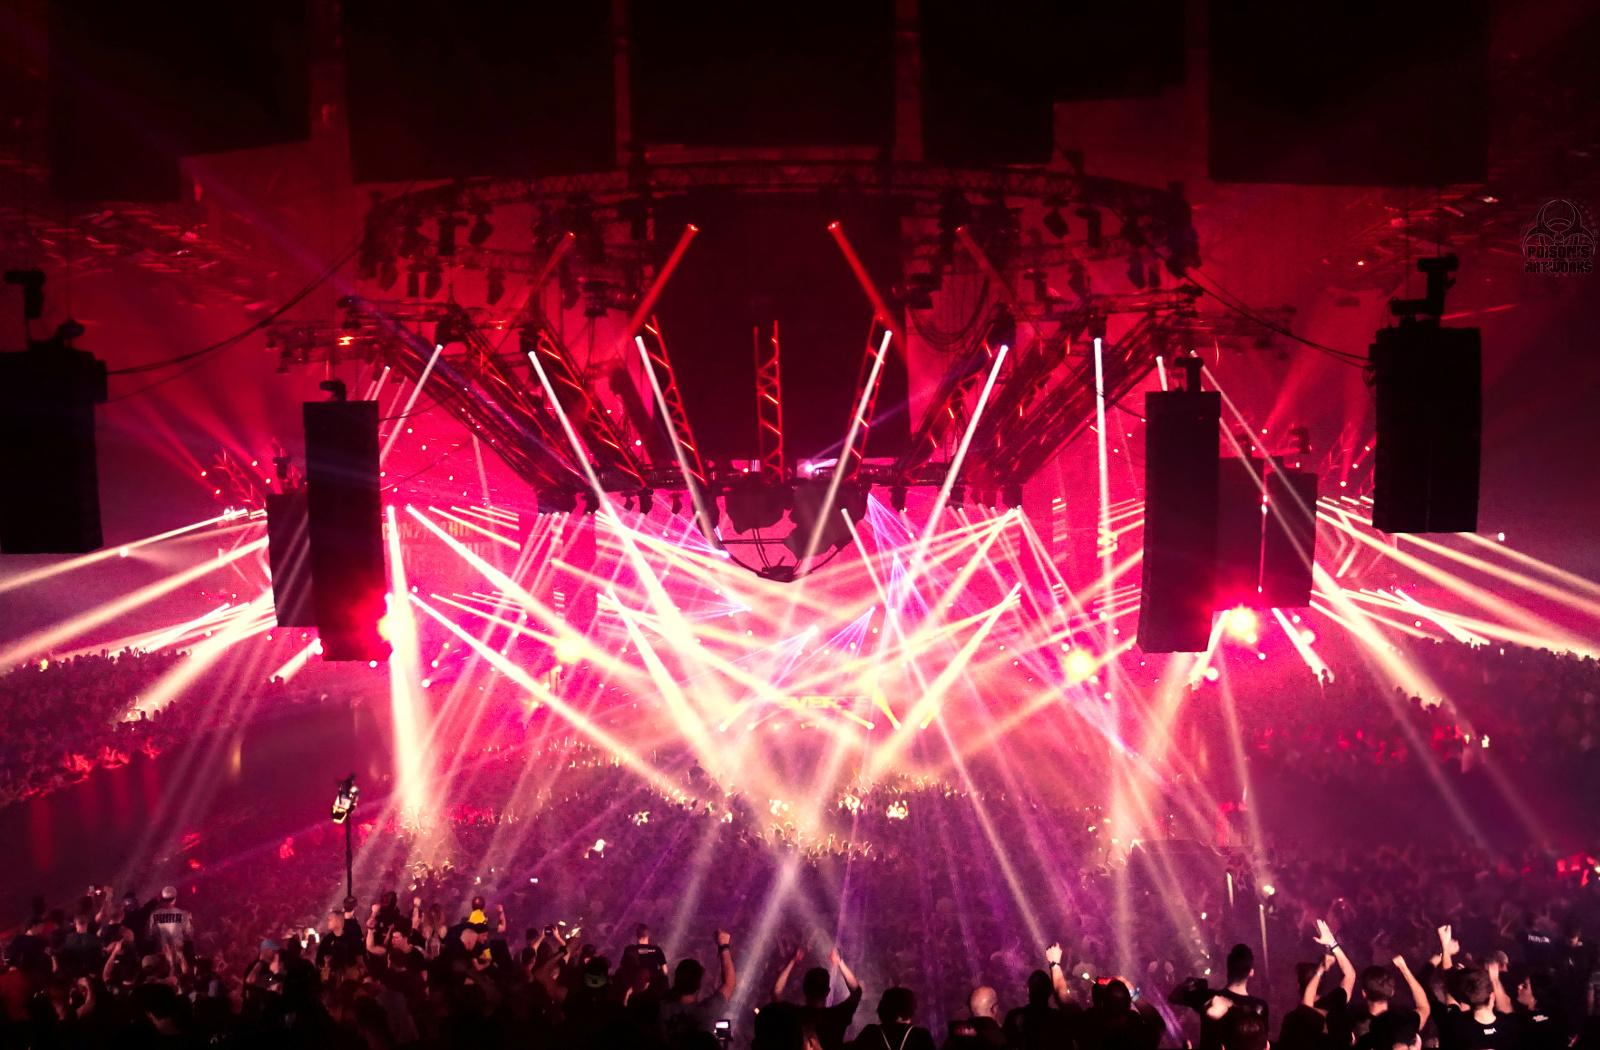 REVERZE - 7 Mars 2020 - Sportpaleis/Lotto Arena - Anvers - BE Dsc04710